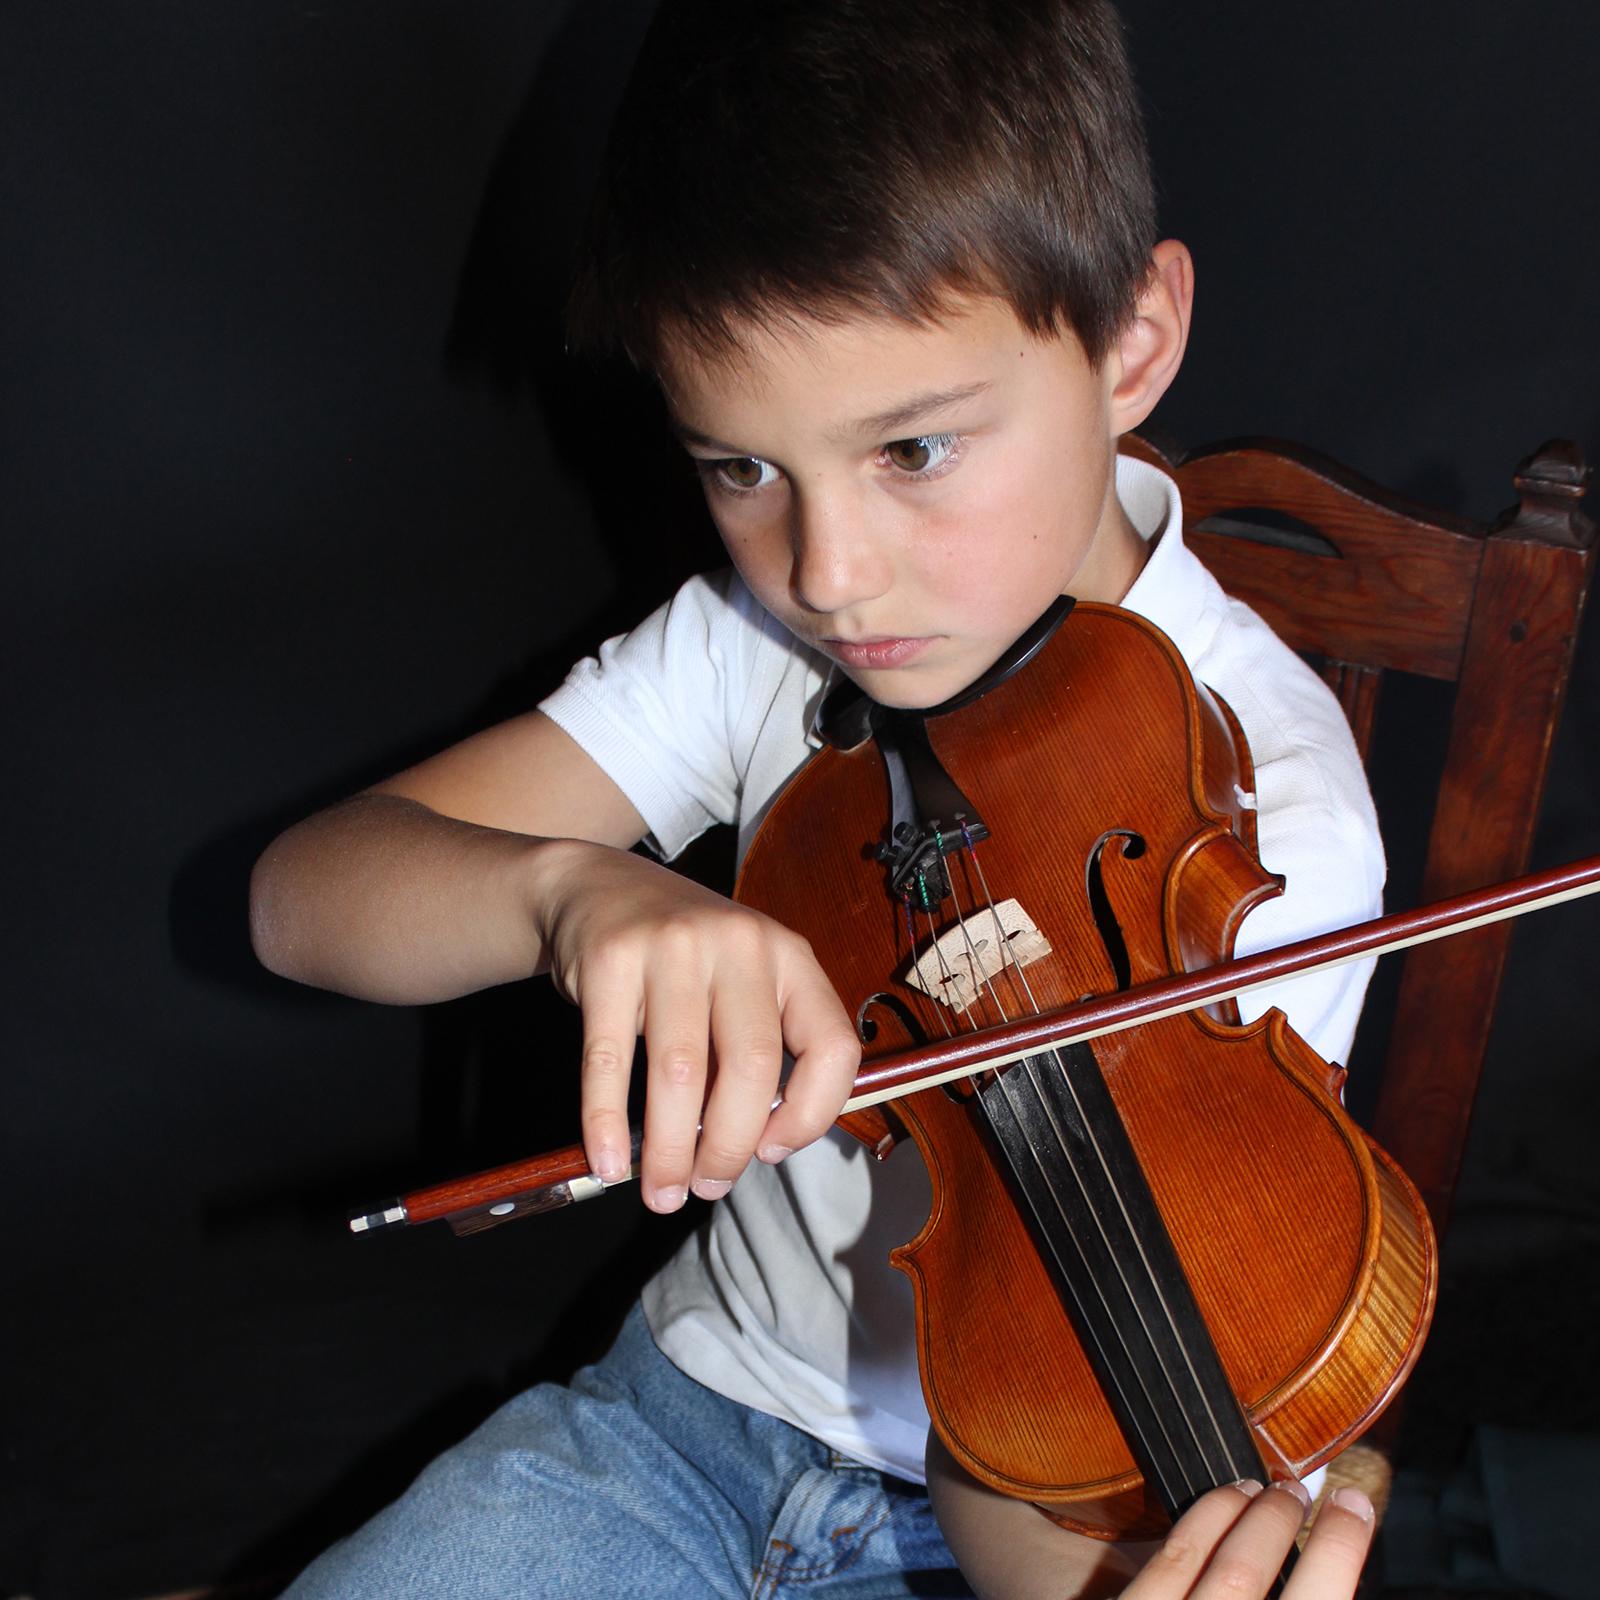 Aprender-Musica-en-Tempo-Musical